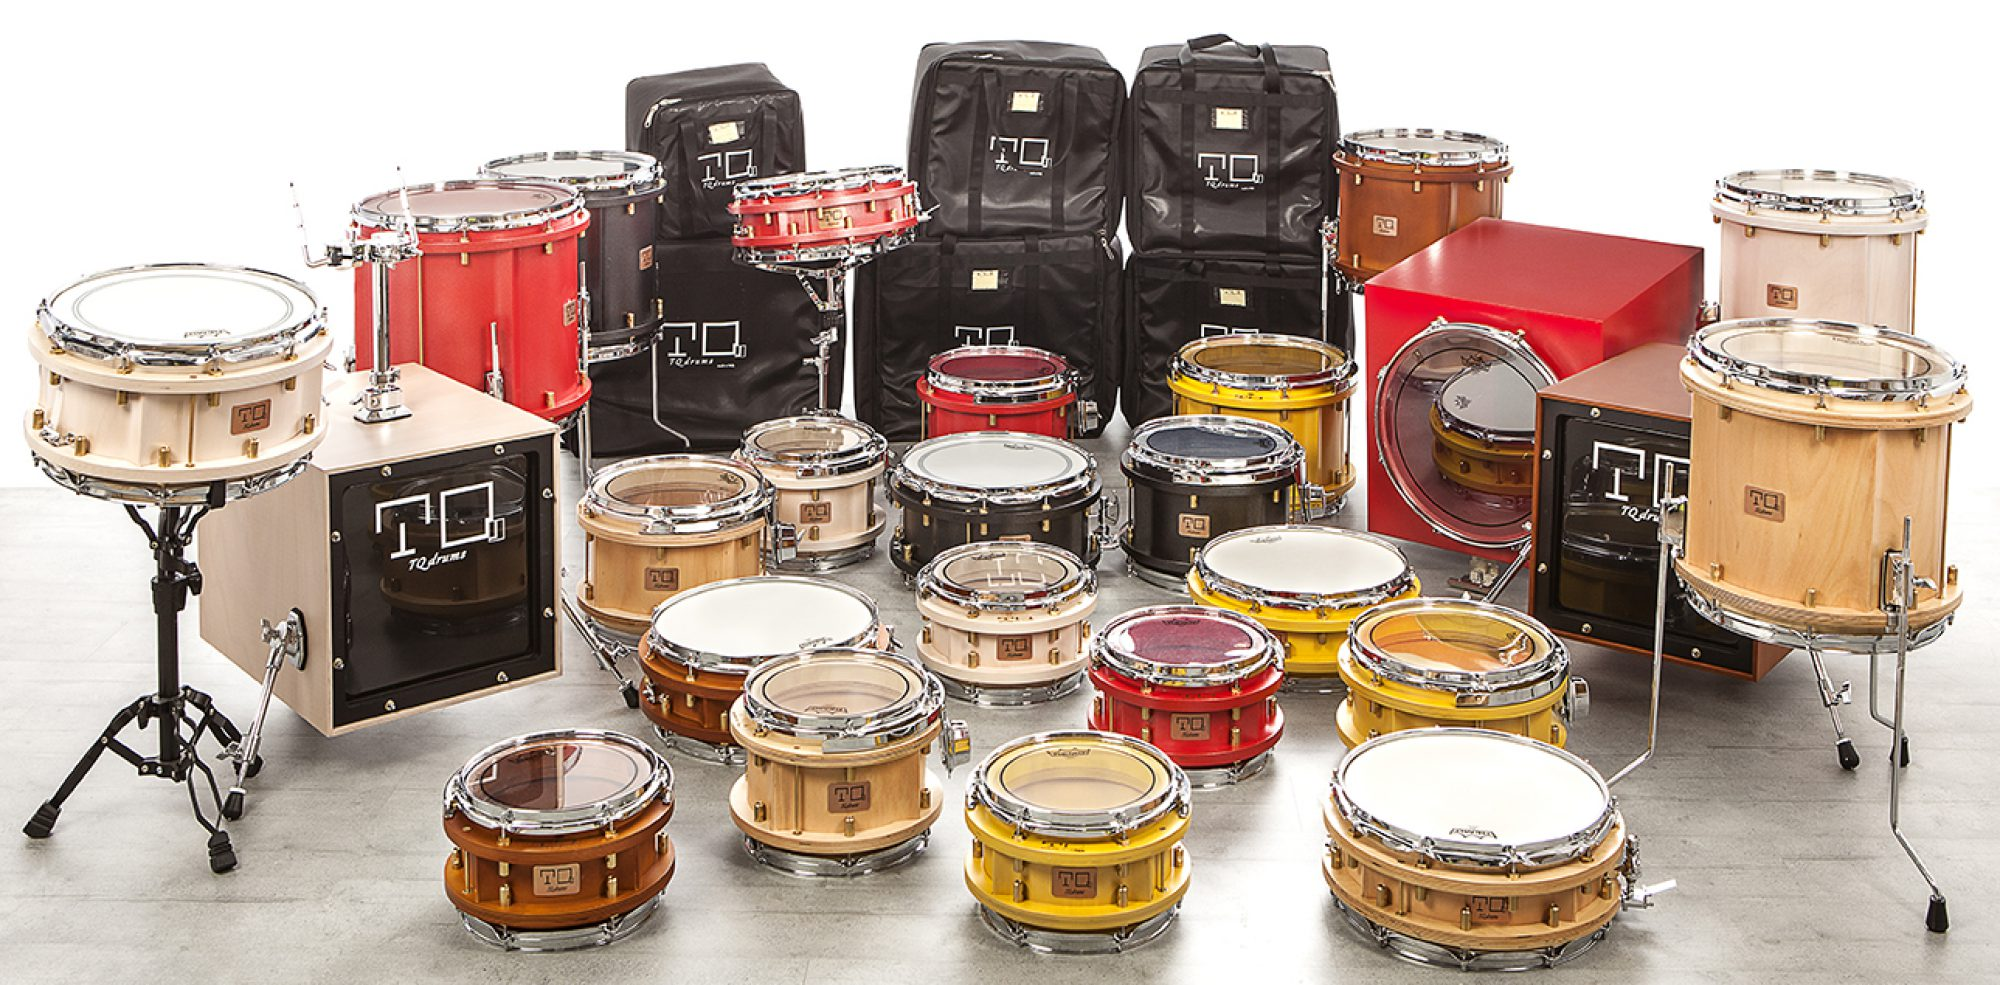 TestaQuadra drums